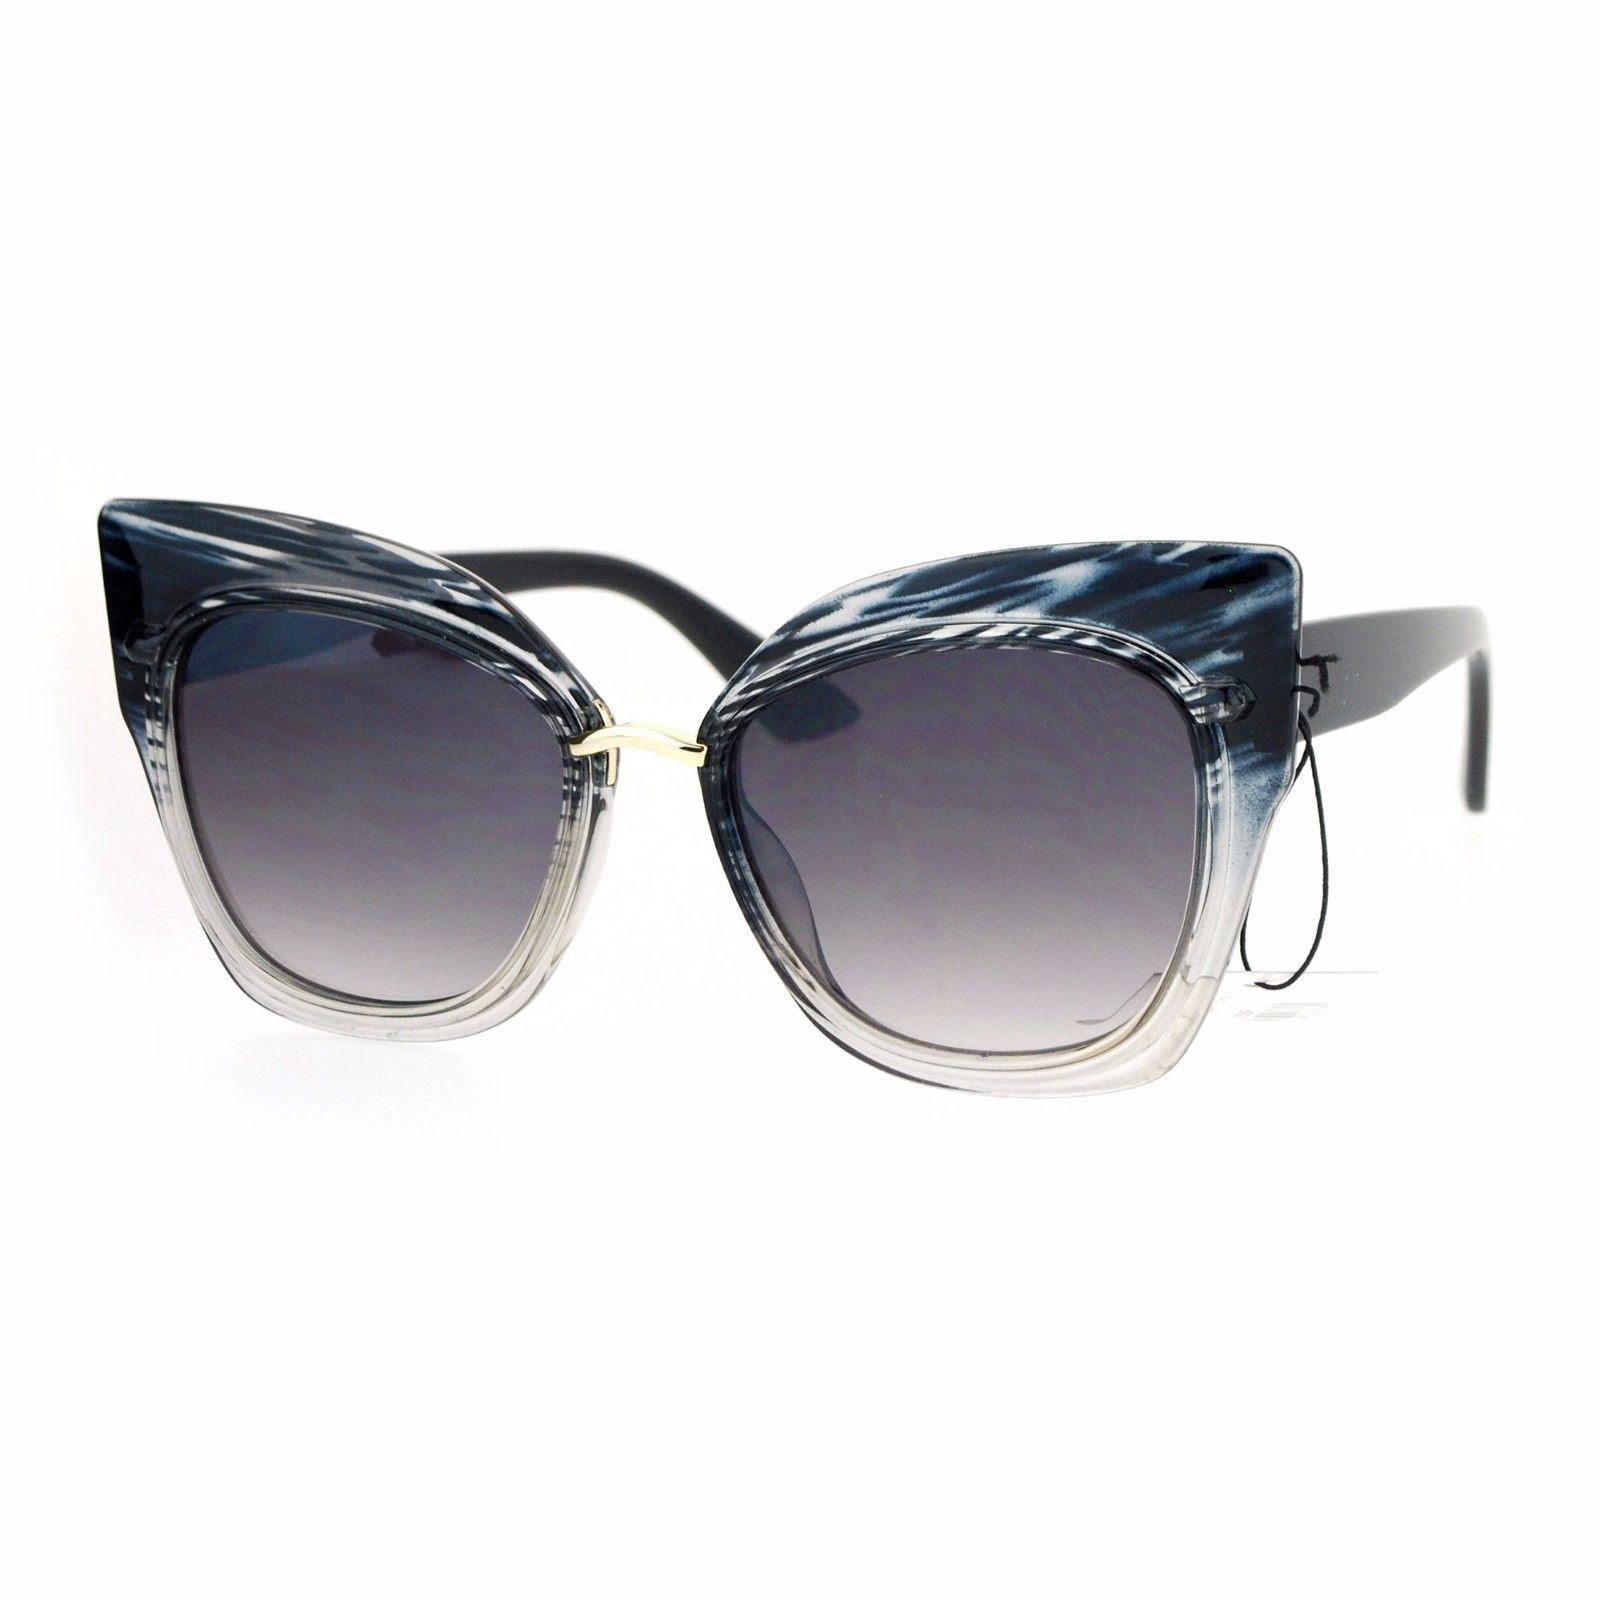 Oversized Fashion Sunglasses Womens Square Cateye Butterfly UV 400 image 9